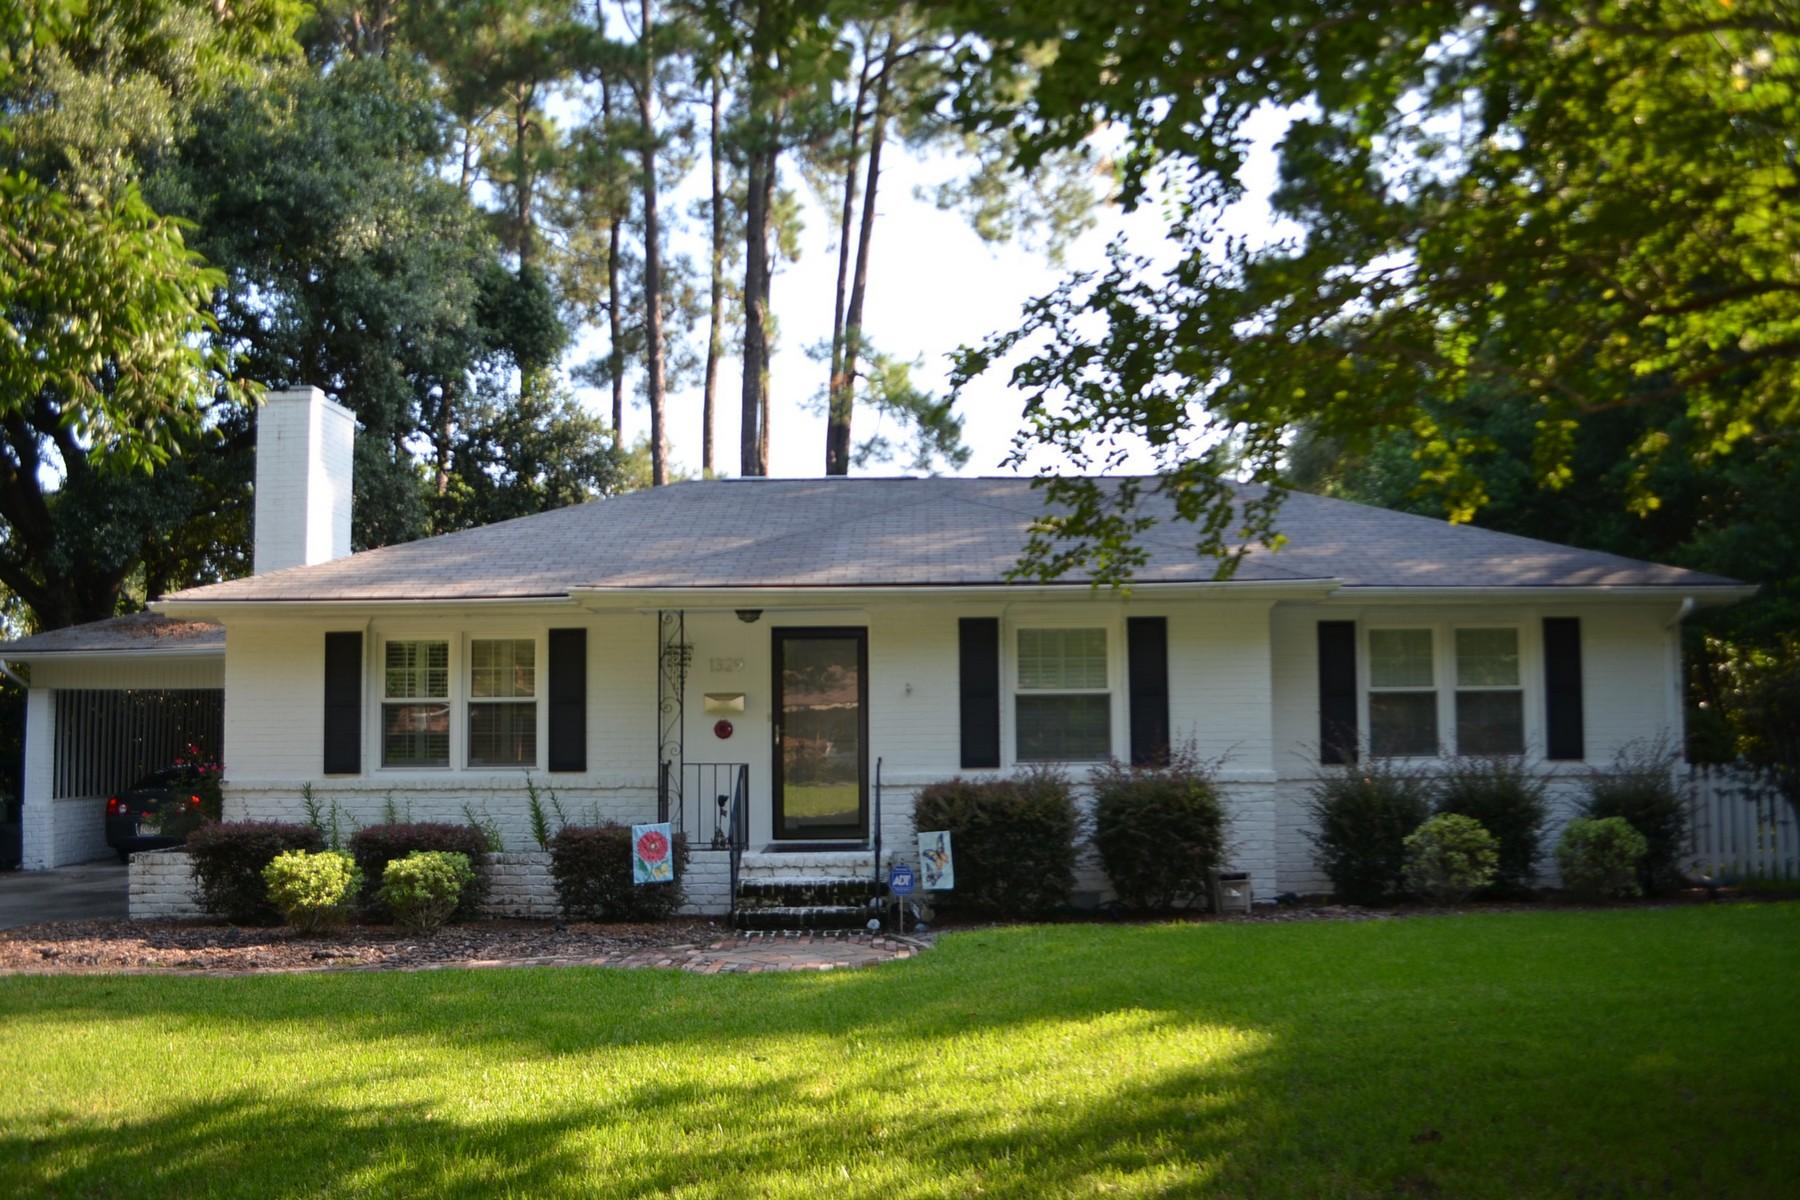 Single Family Home for Sale at Fairway Oaks 1329 Brightwood Drive Fairway Oaks, Savannah, Georgia 31406 United States